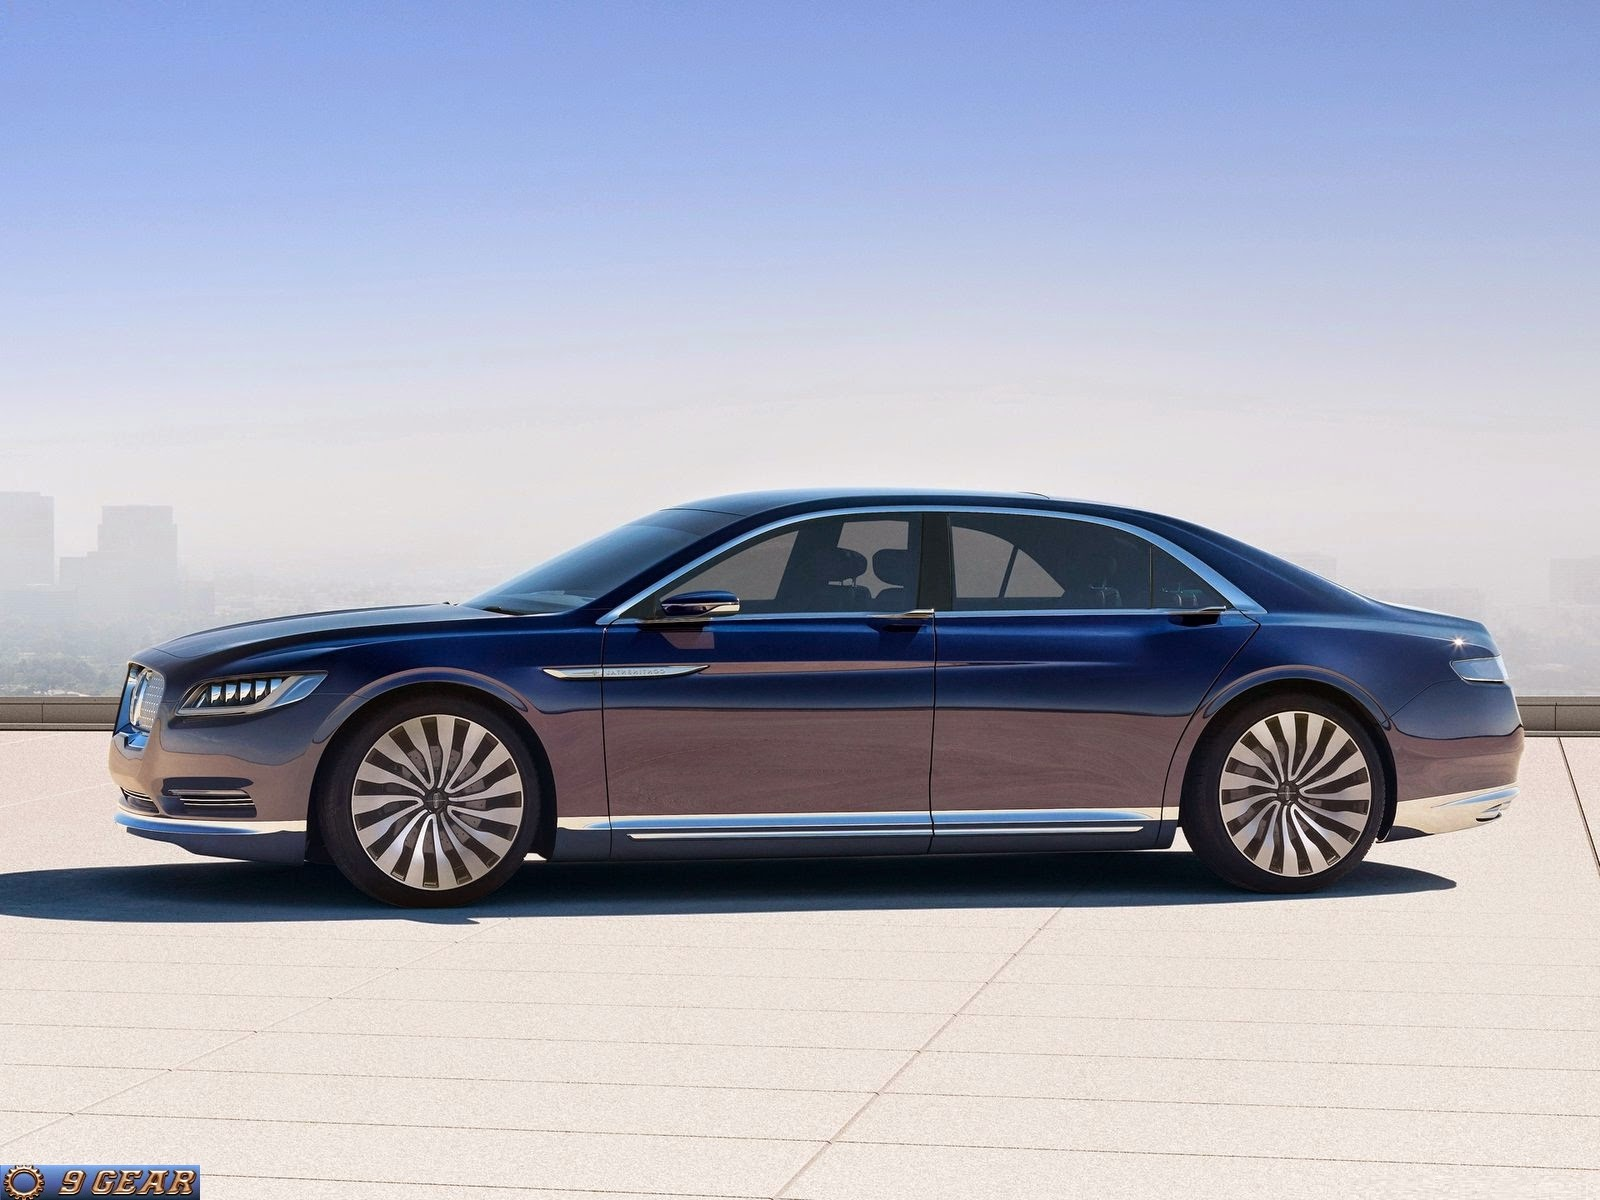 New lincoln Continental Concept Sedan 2015 | Car Reviews | New Car ...